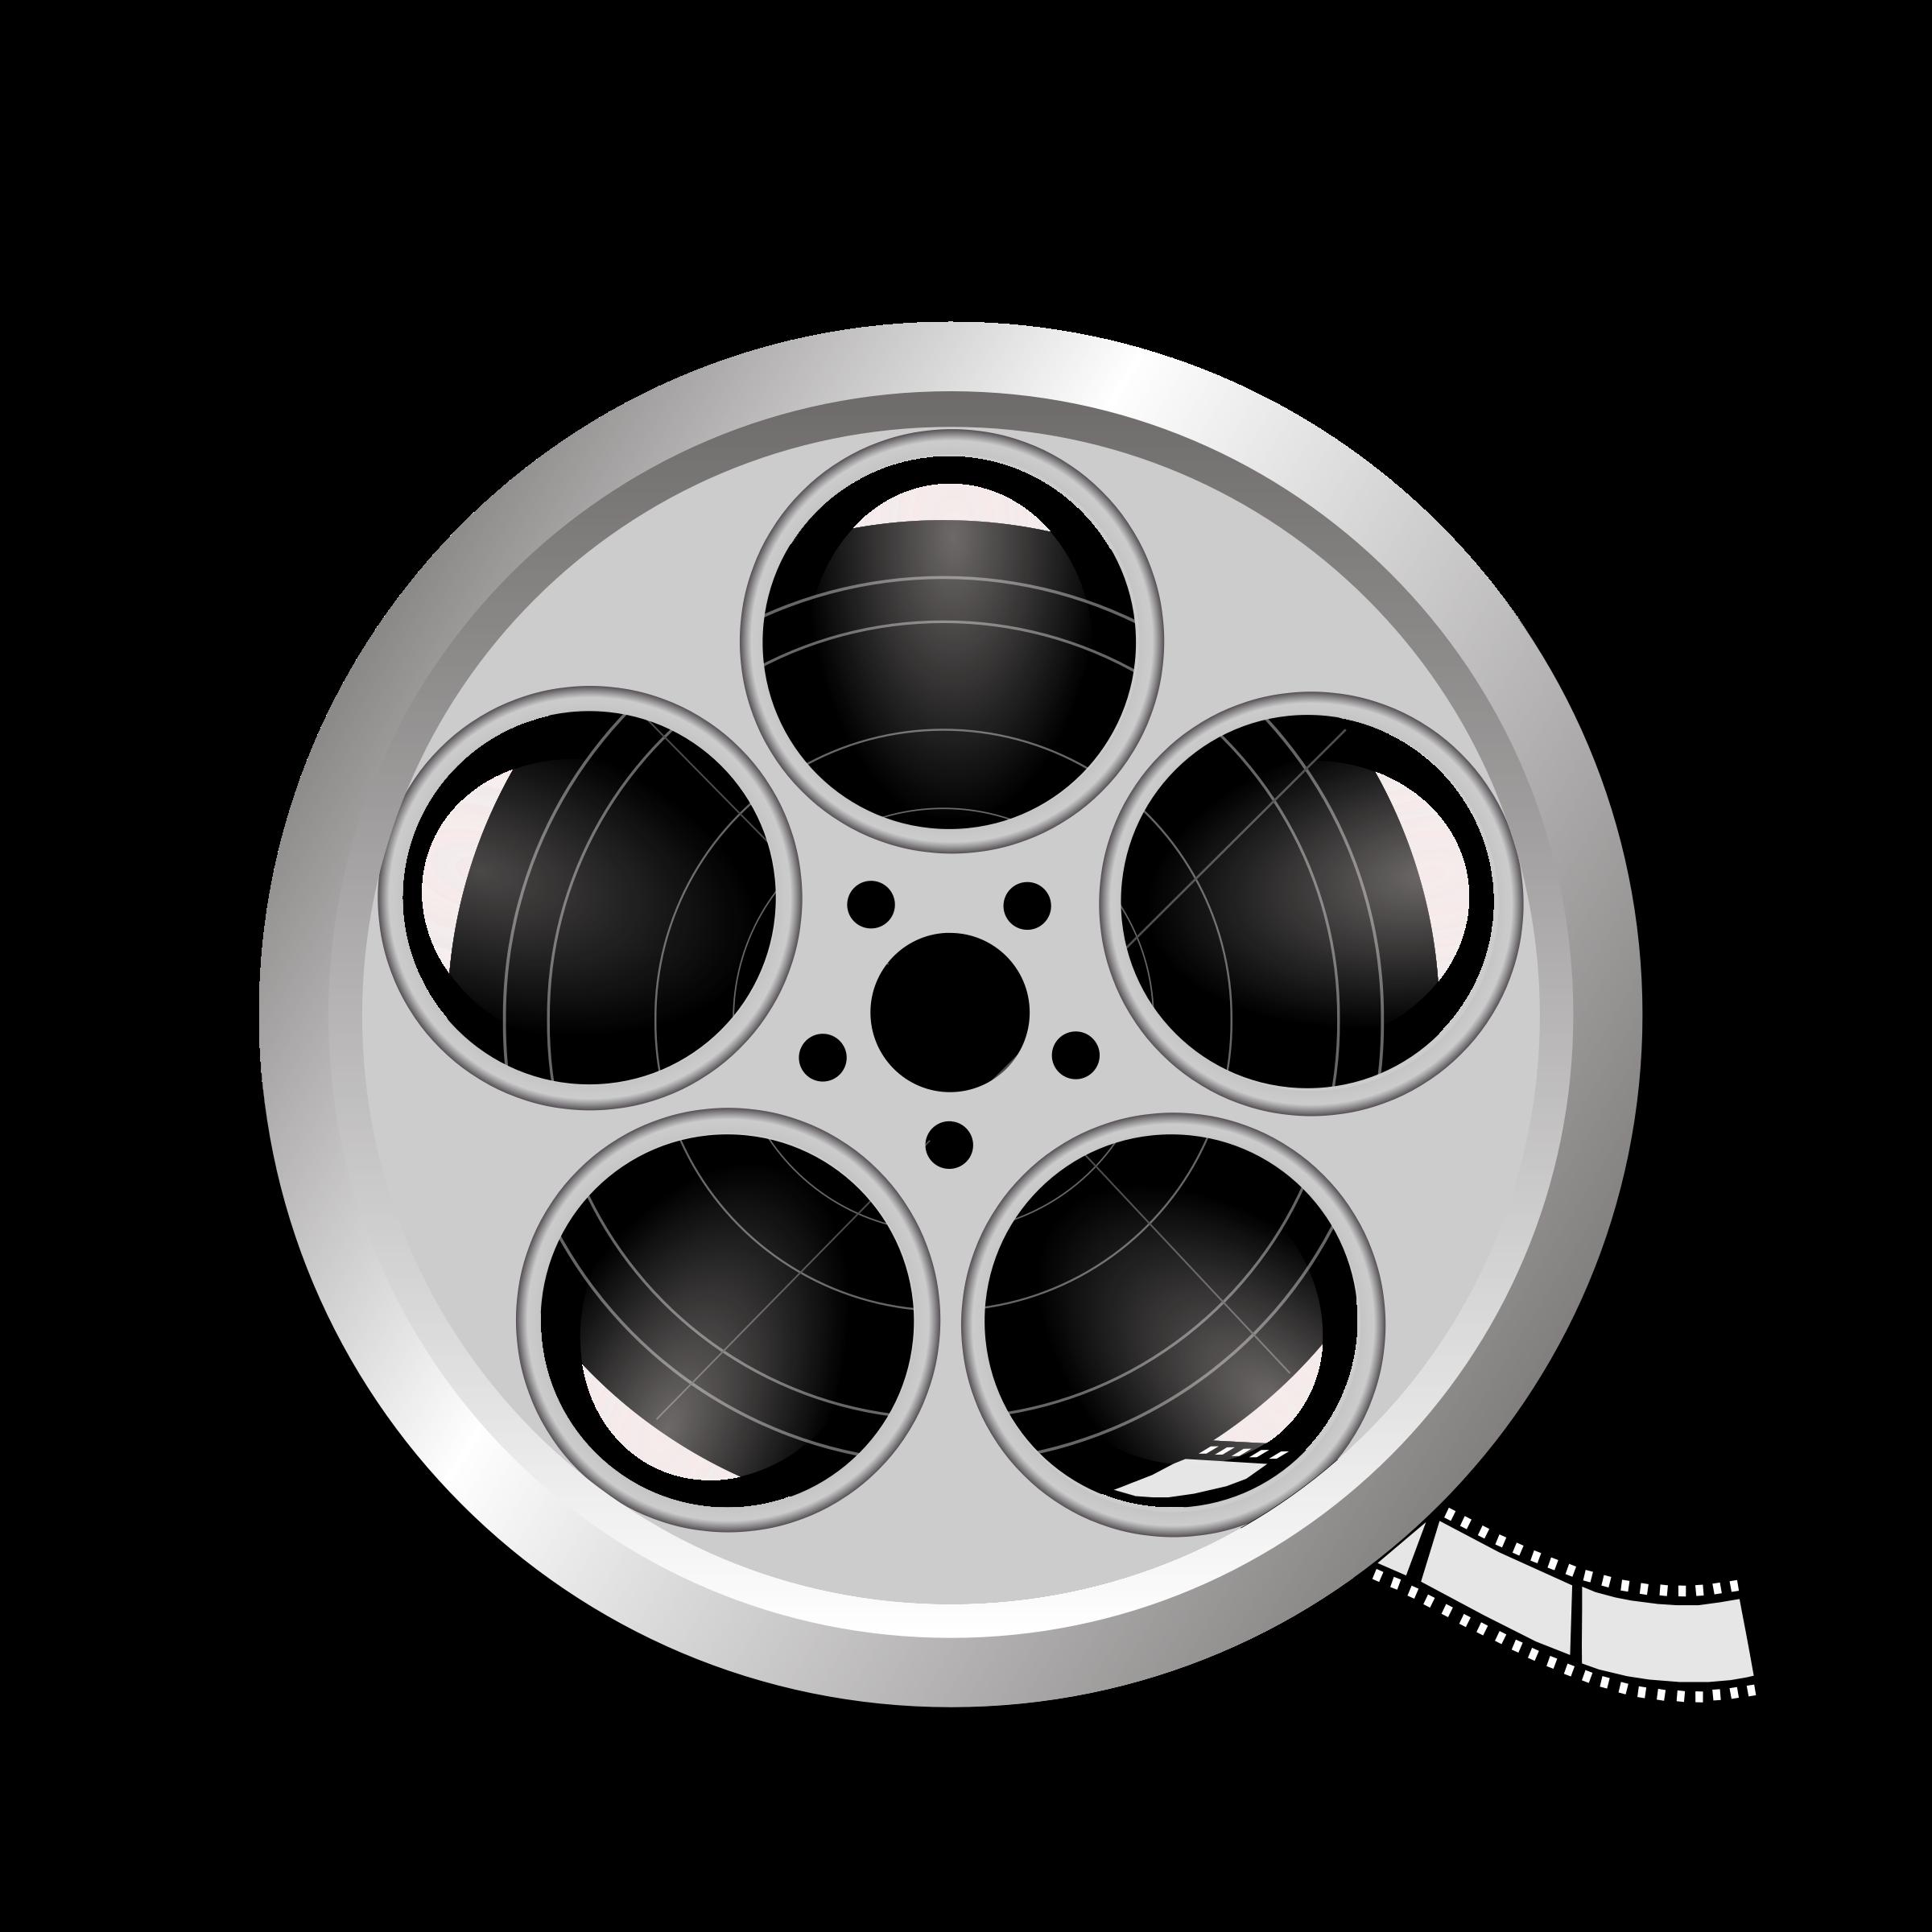 Film Roll Clip Art - Cliparts.co